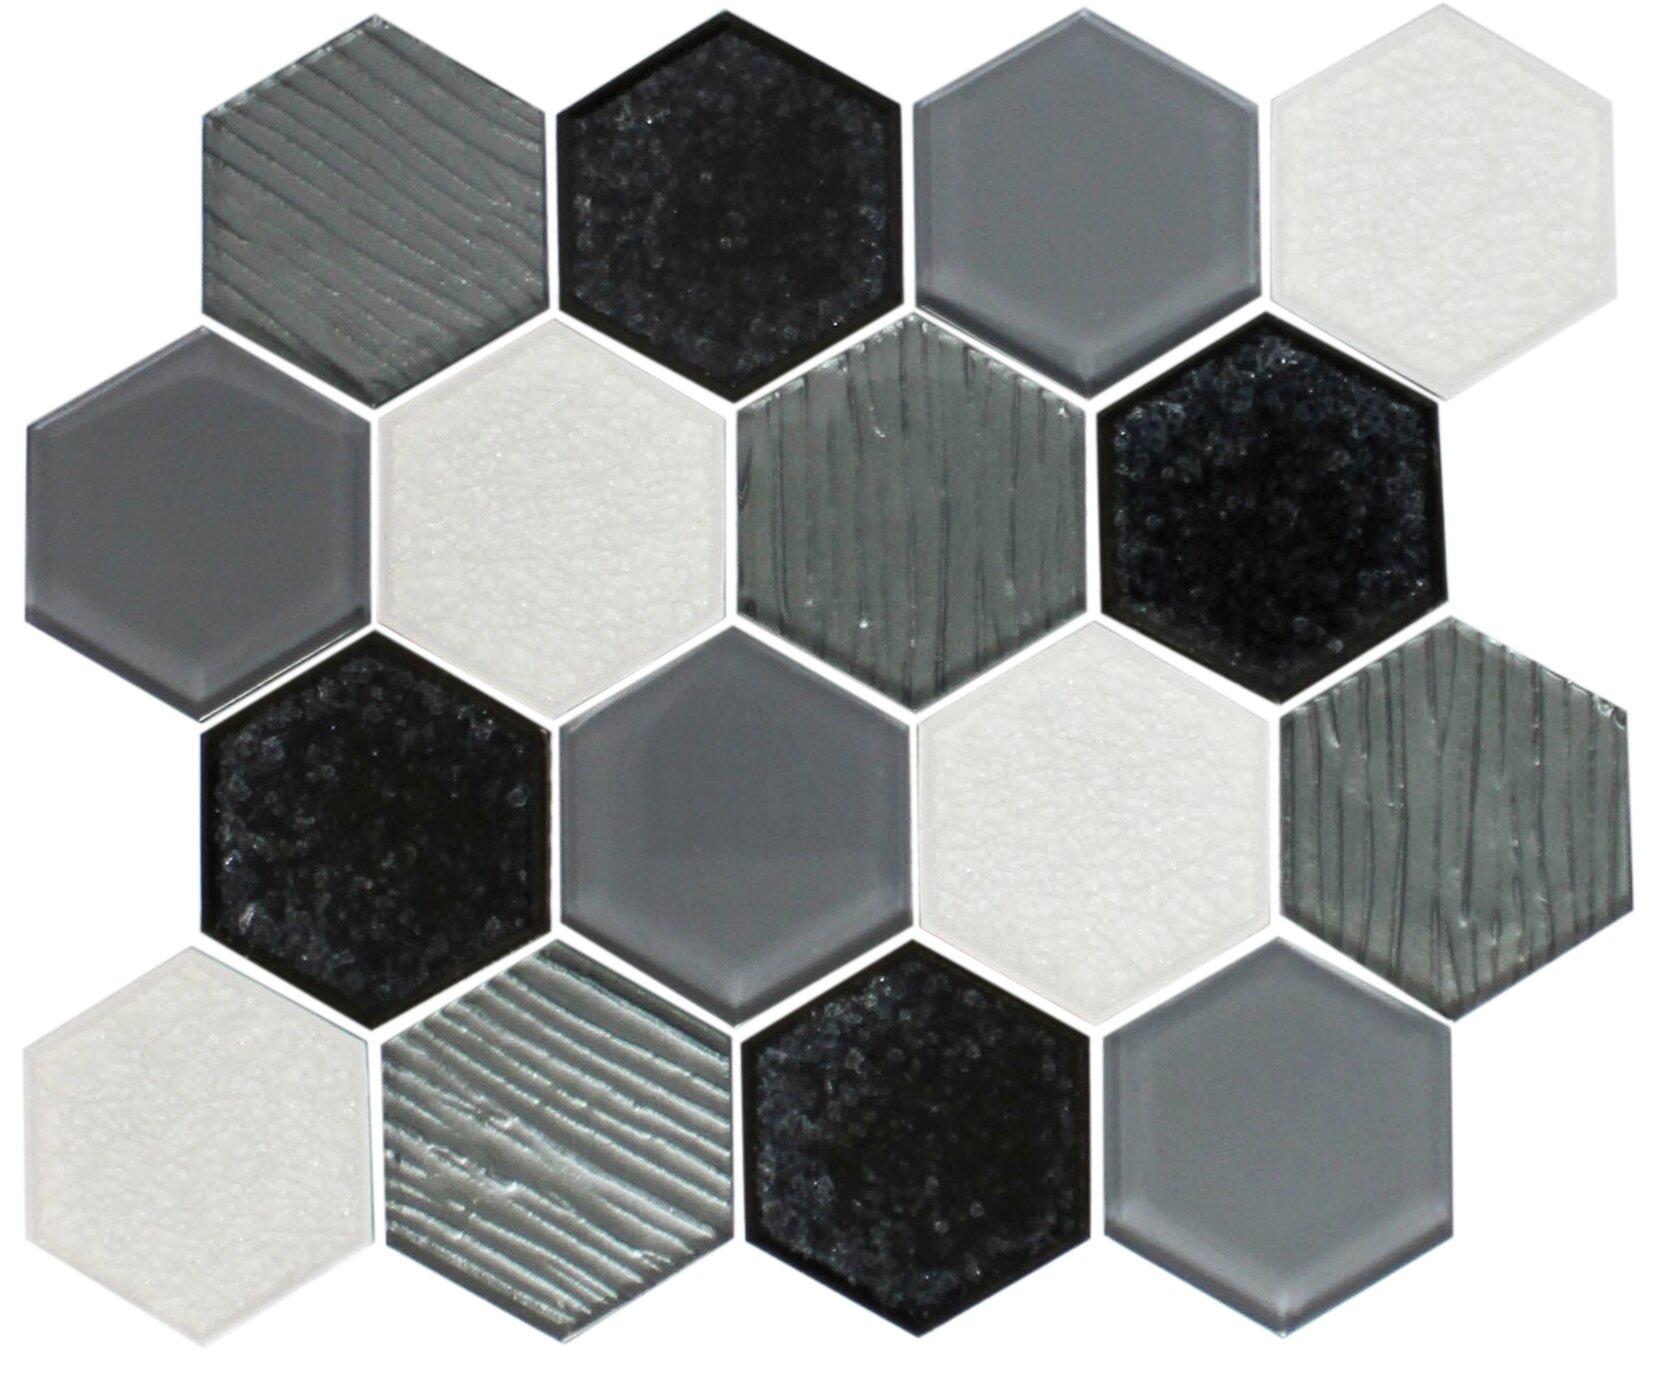 Susanjablon Crackle Hexagon Mix Random Sized Glass Mosaic Tile In White Black Wayfair